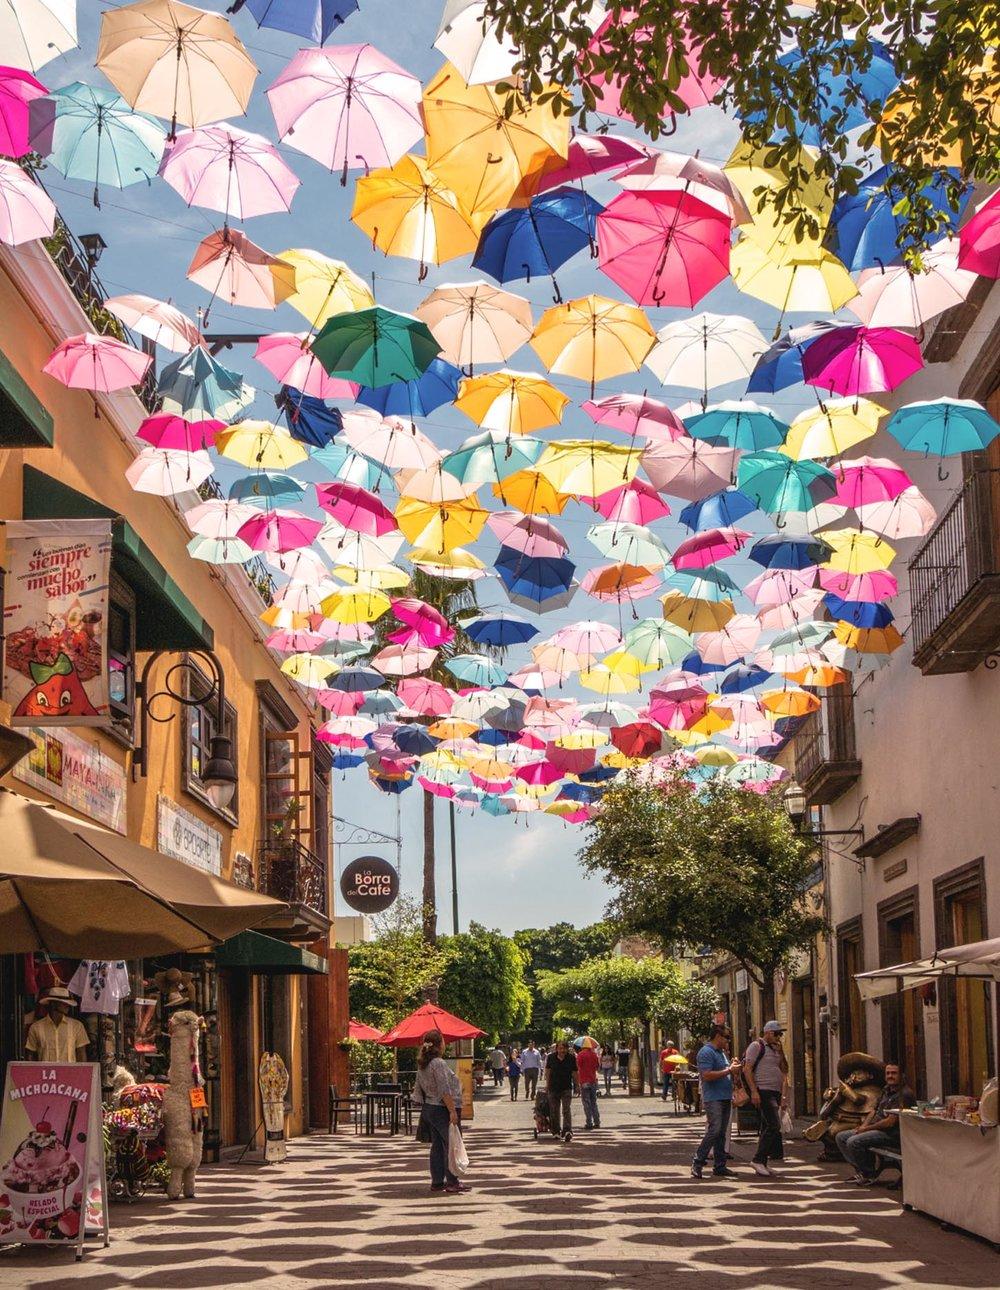 Guadalajara to Tlaquepaque, Jalisco